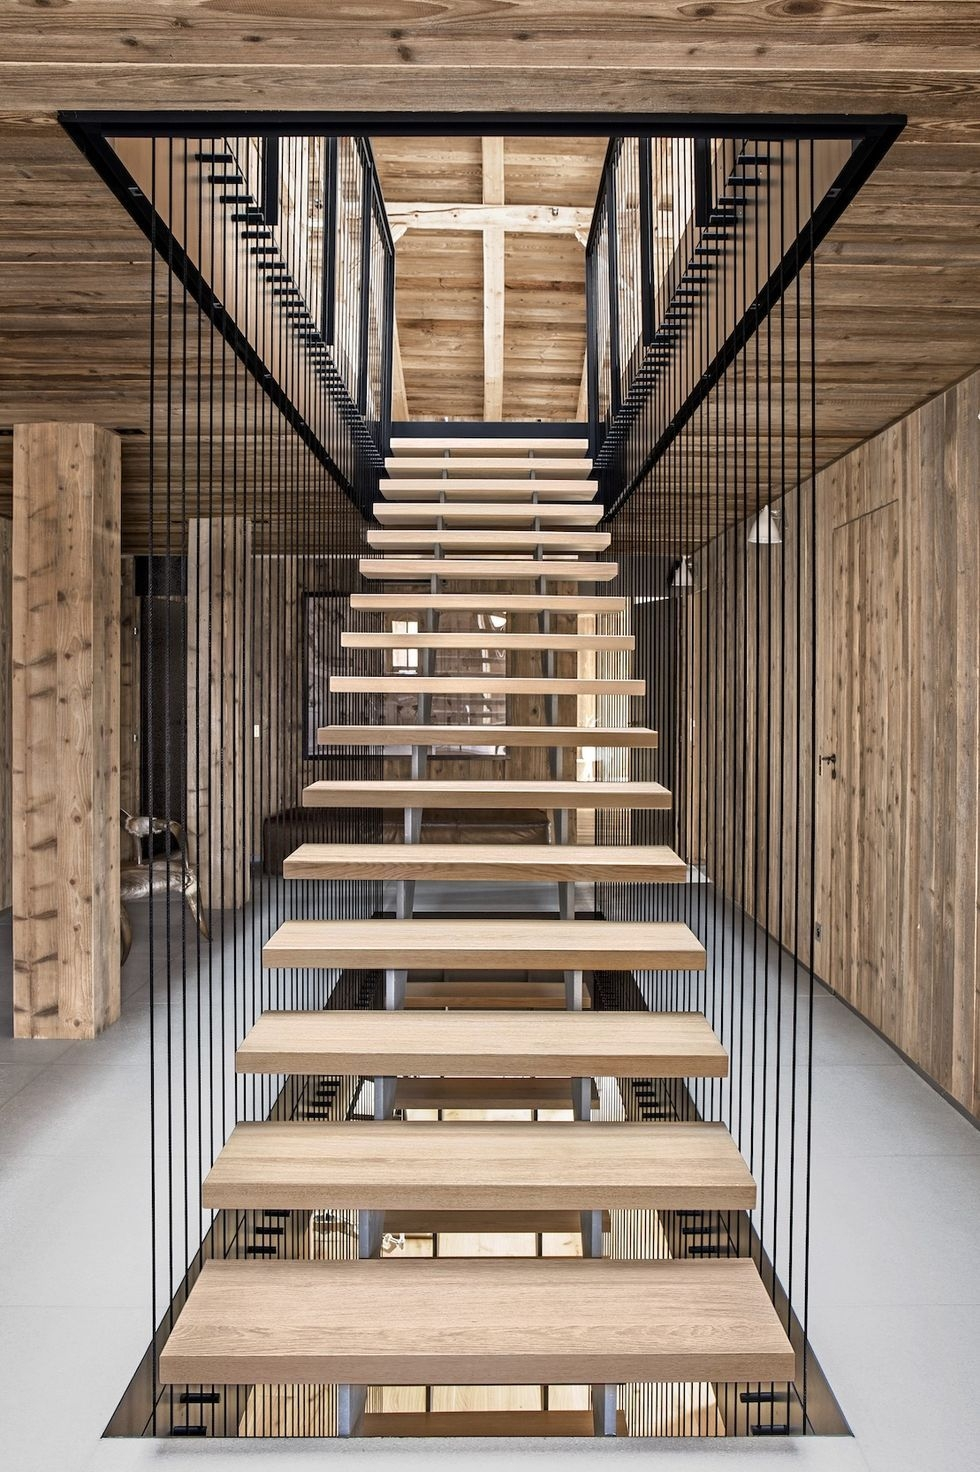 20 Striking Open Stairs Modern Open Staircase Design Ideas | 2 Stairs House Design | Interior | Dream House | Box Type | Basic | Ultra Modern